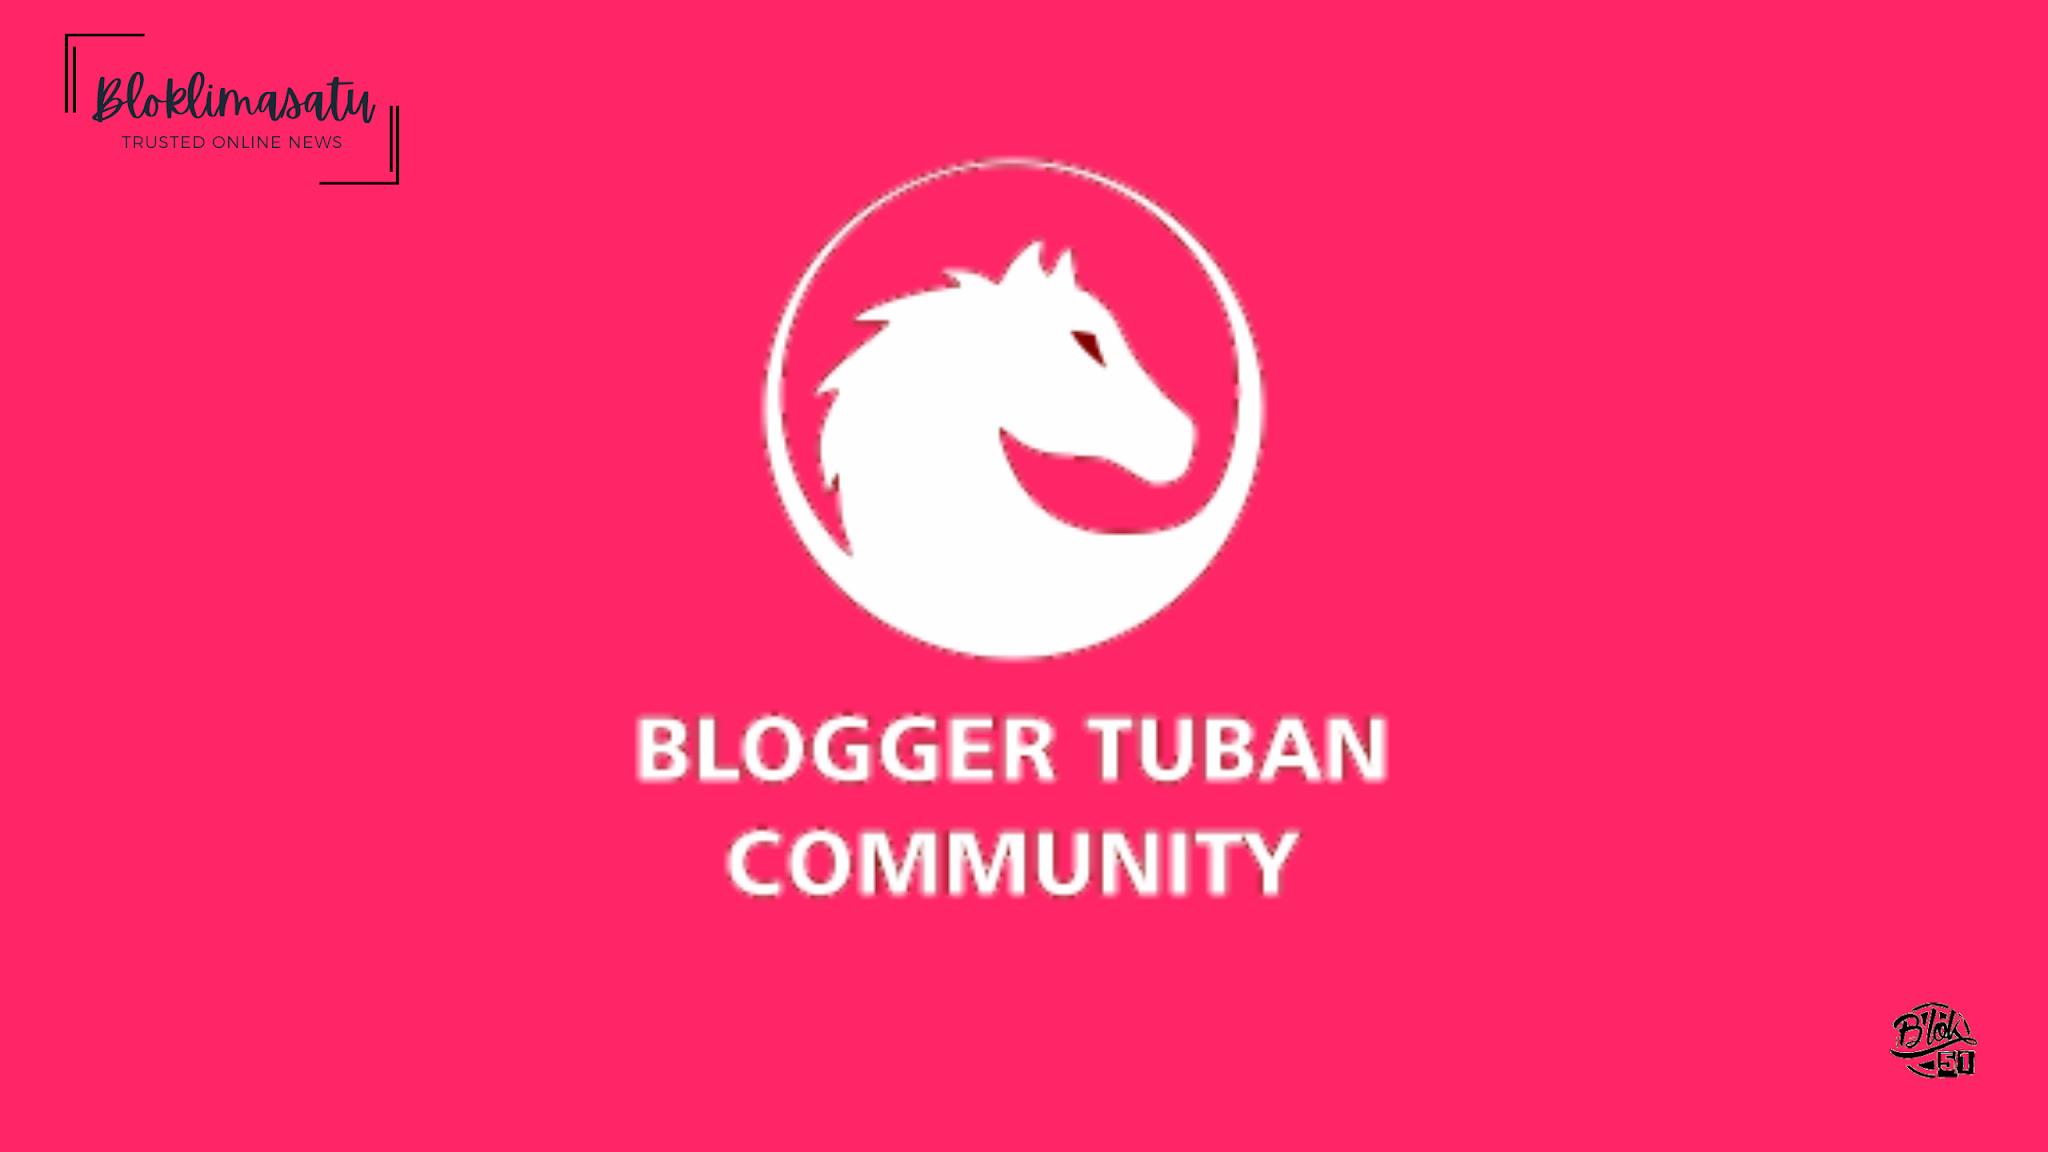 Daftar Blogger Tuban yang mendunia